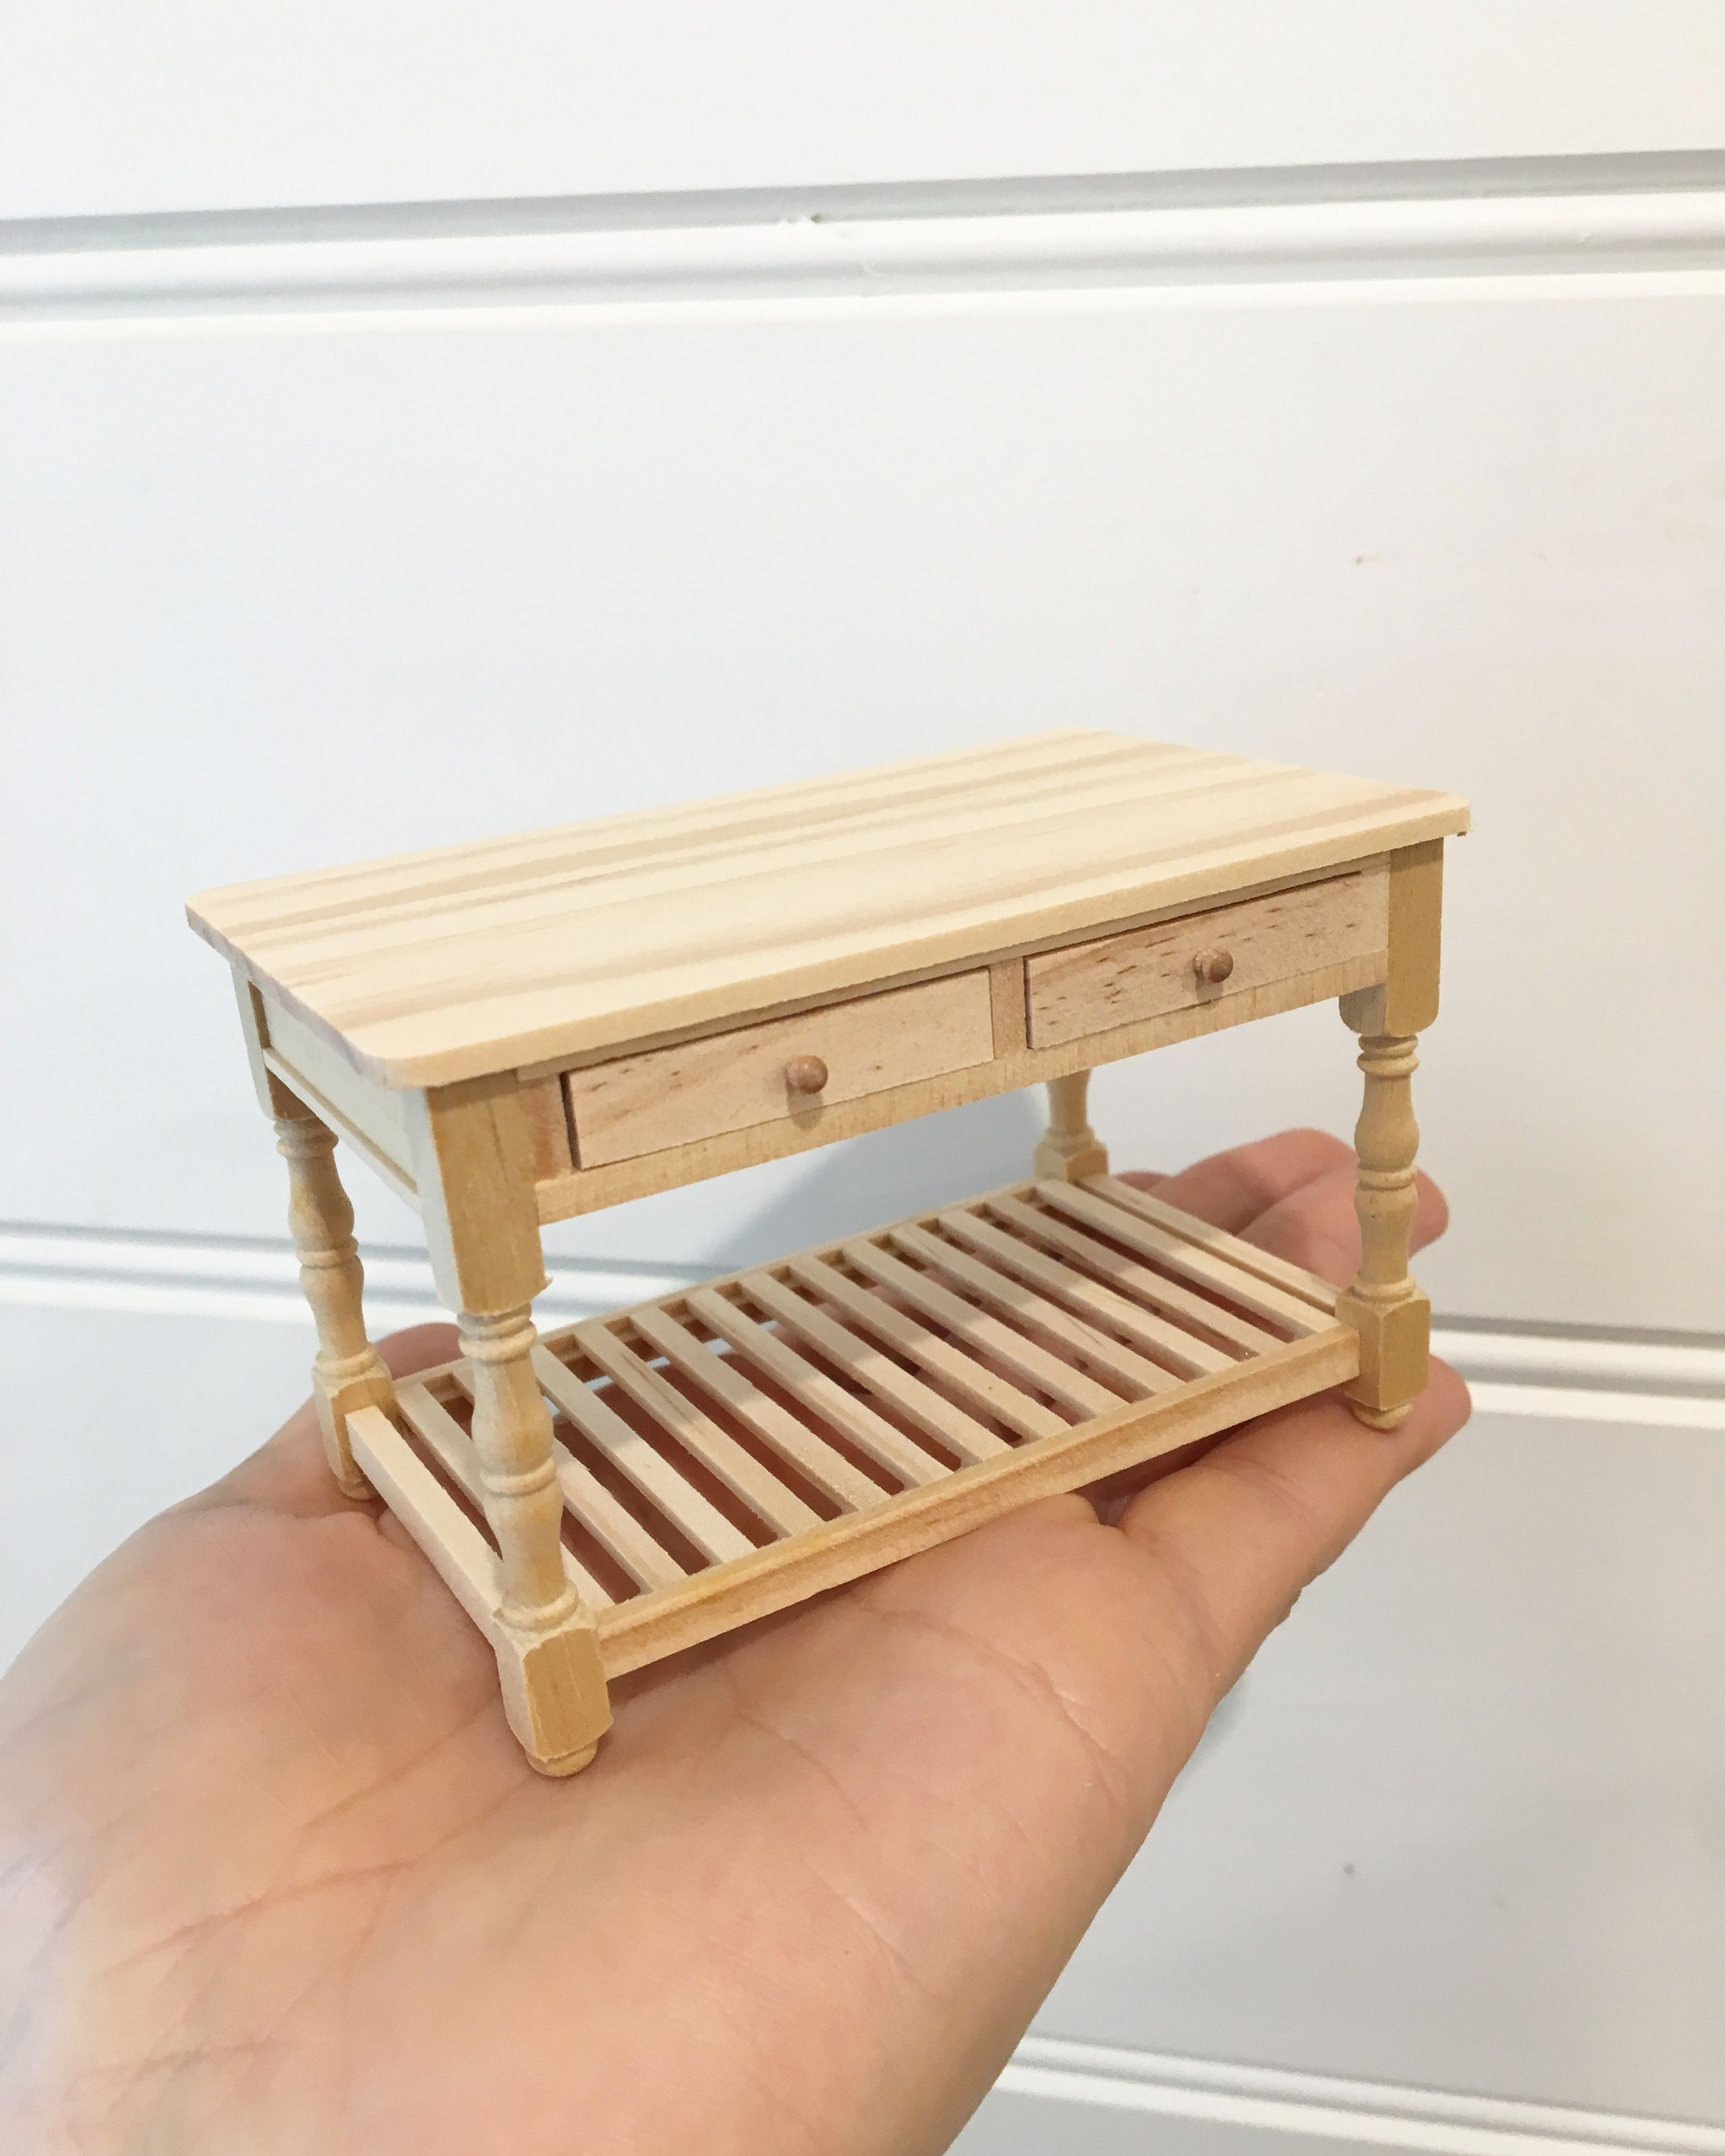 miniature dollhouse furniture woodworking. miniature kitchen, houses, furniture, dollhouse miniatures, doll barbie, mockup, woodworking furniture n